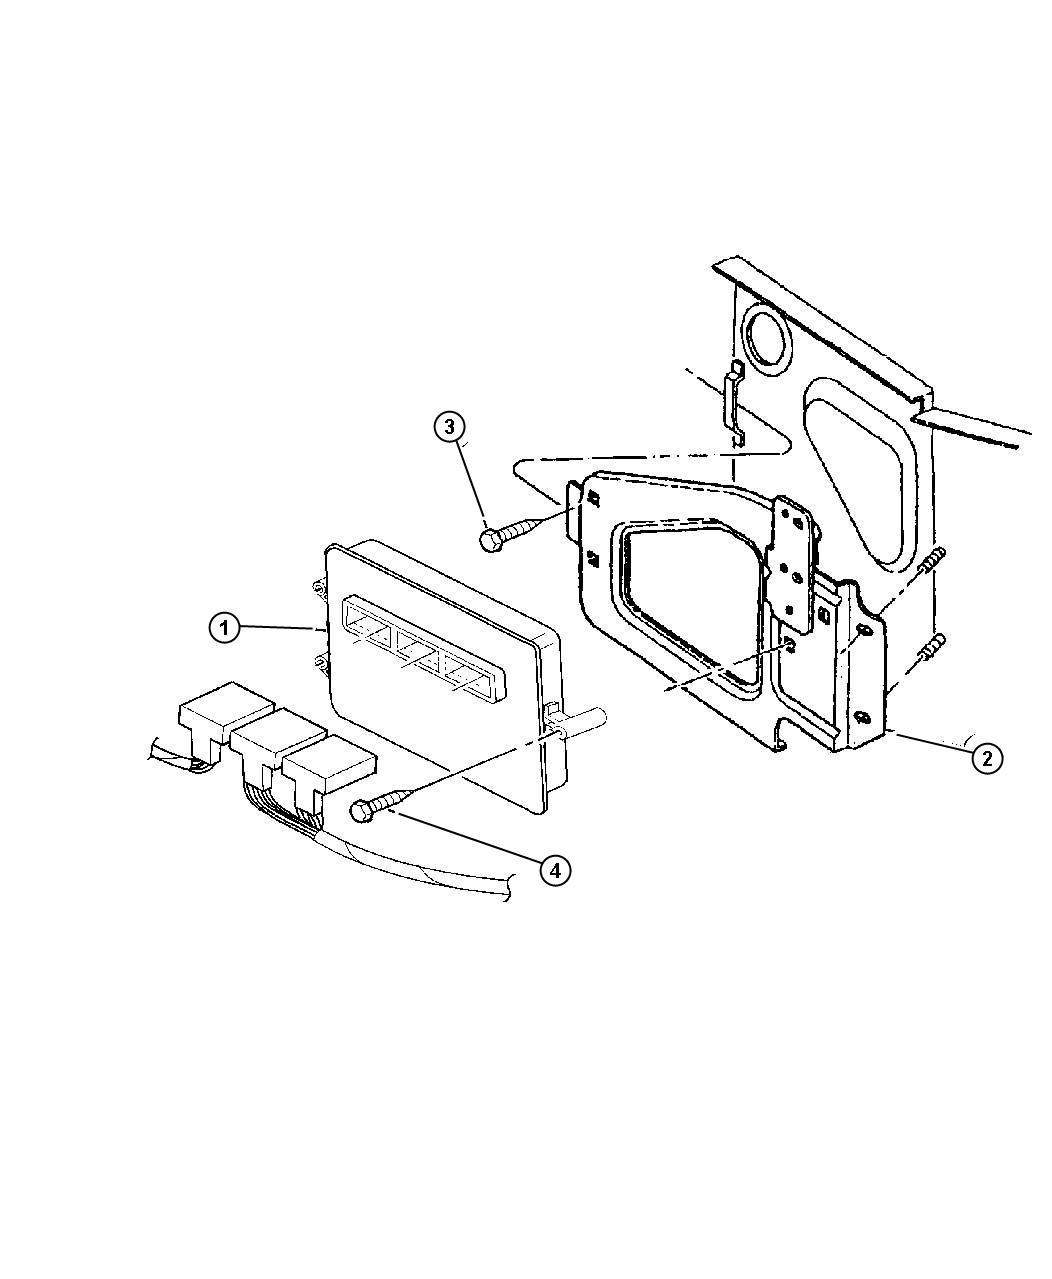 2000 dodge durango module powertrain control. Black Bedroom Furniture Sets. Home Design Ideas